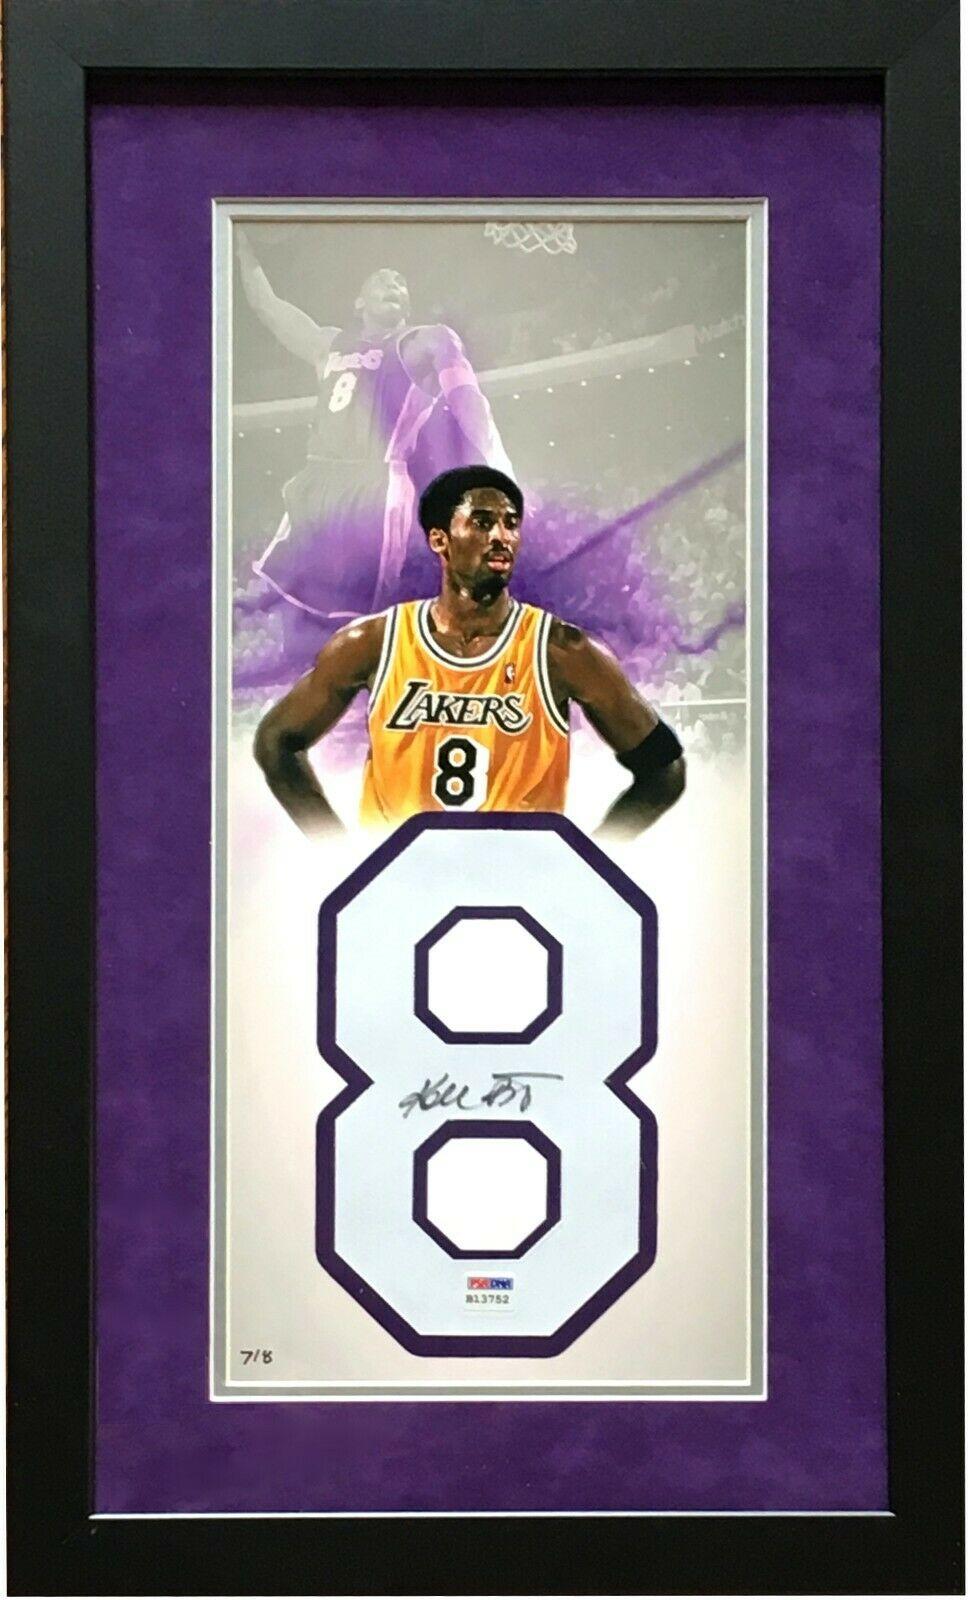 Kobe Bryant Signed Lakers #8 Jersey Number photo framed vintage auto PSA COA /8 (Copy)